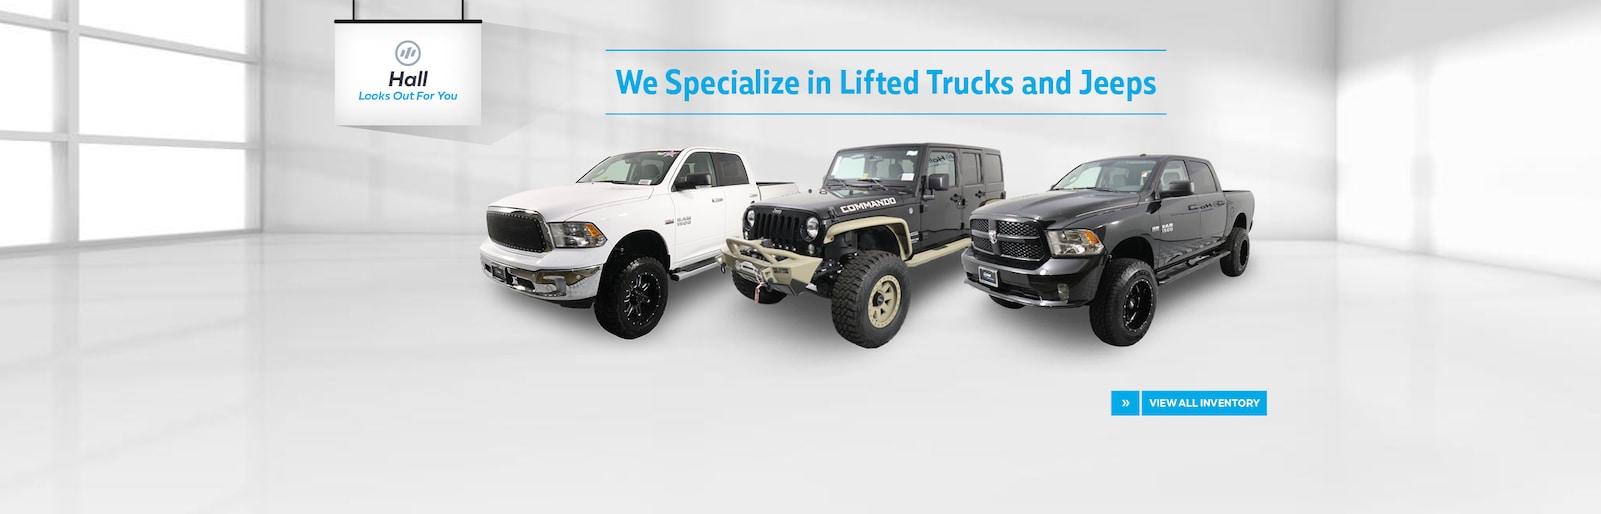 New and Used Cars | Chesapeake Chrysler Dealer